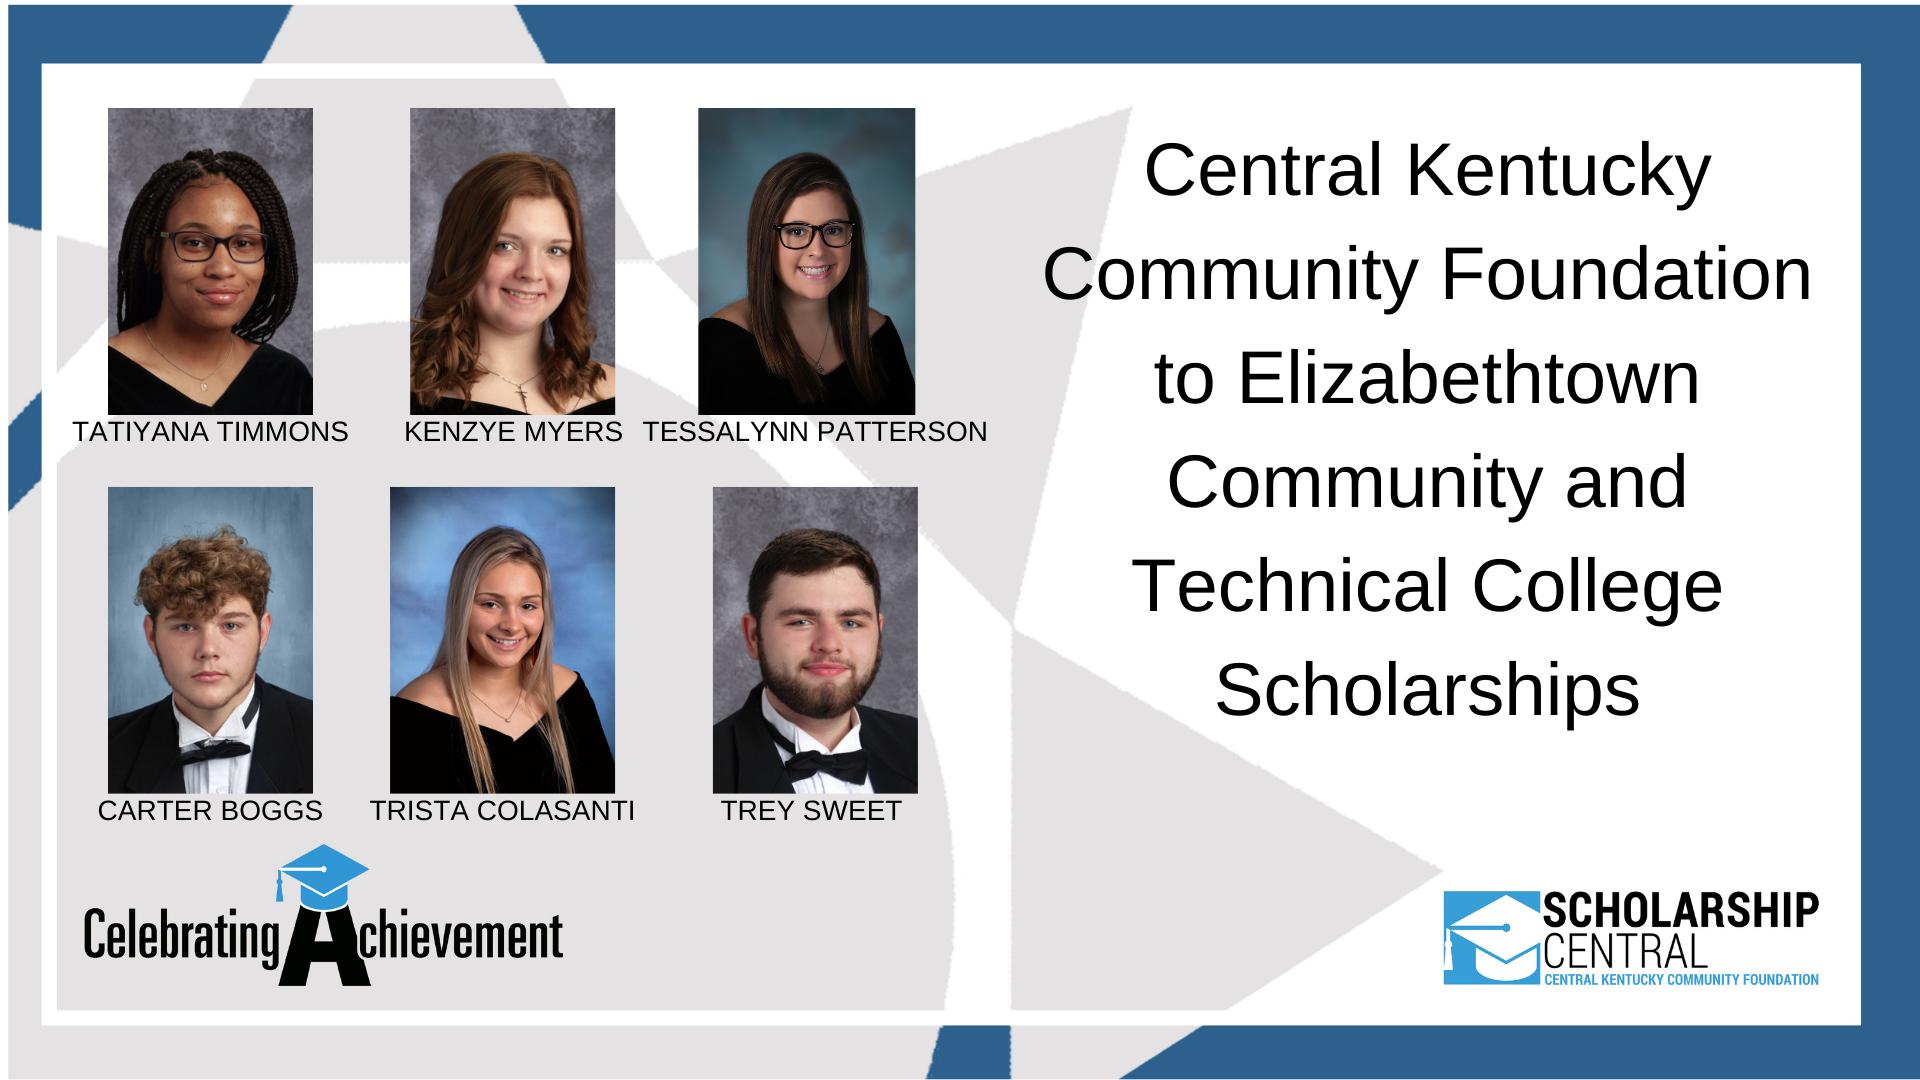 CKCF to ECTC Scholarship Winners 9